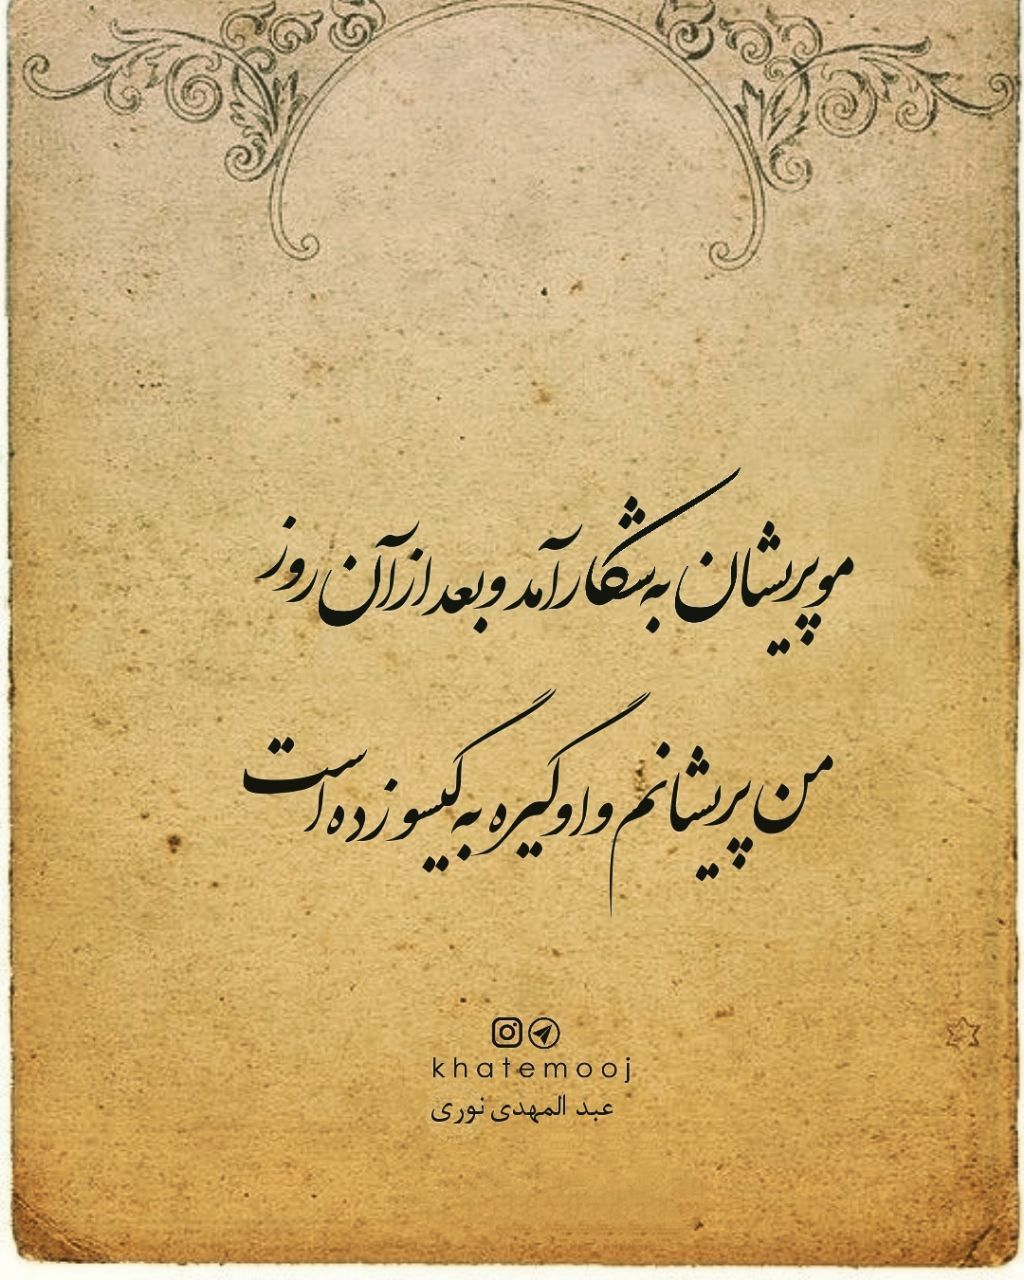 Pin By Sepideh Movahedzadeh On Persian Poem Persian Poem Farsi Poem Poems